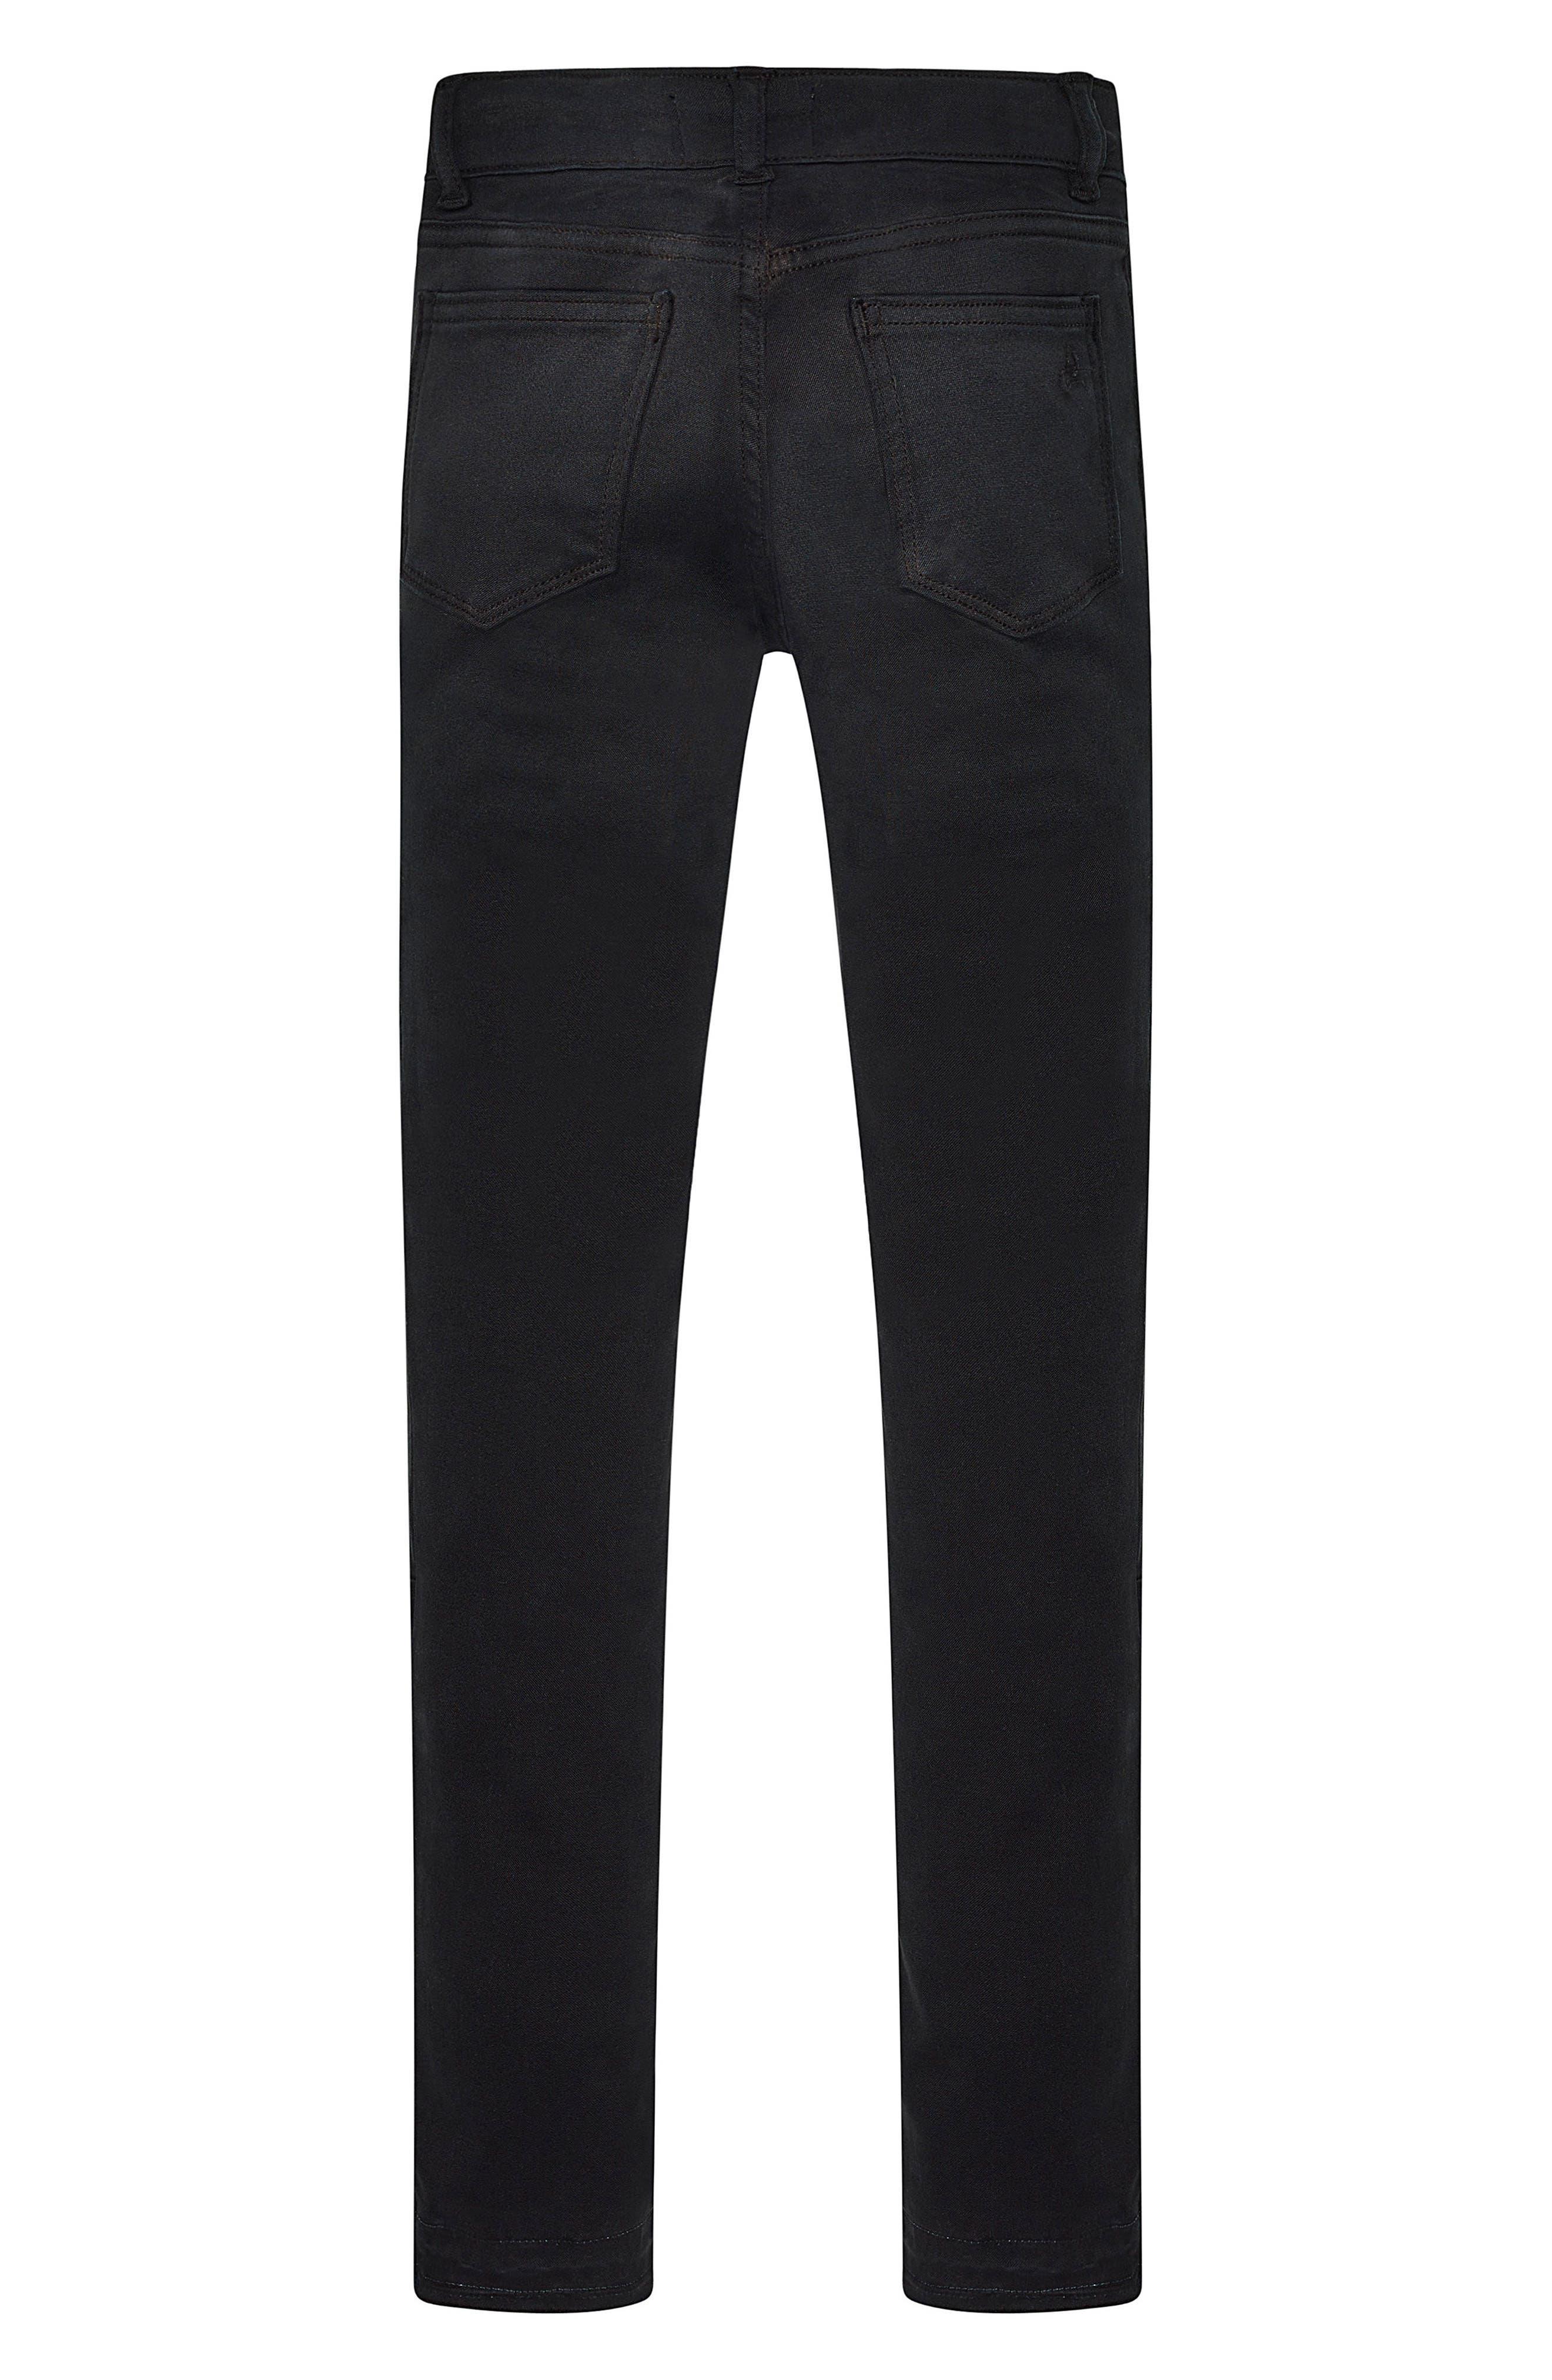 Moto Skinny Jeans,                             Alternate thumbnail 2, color,                             Washed Black Moto